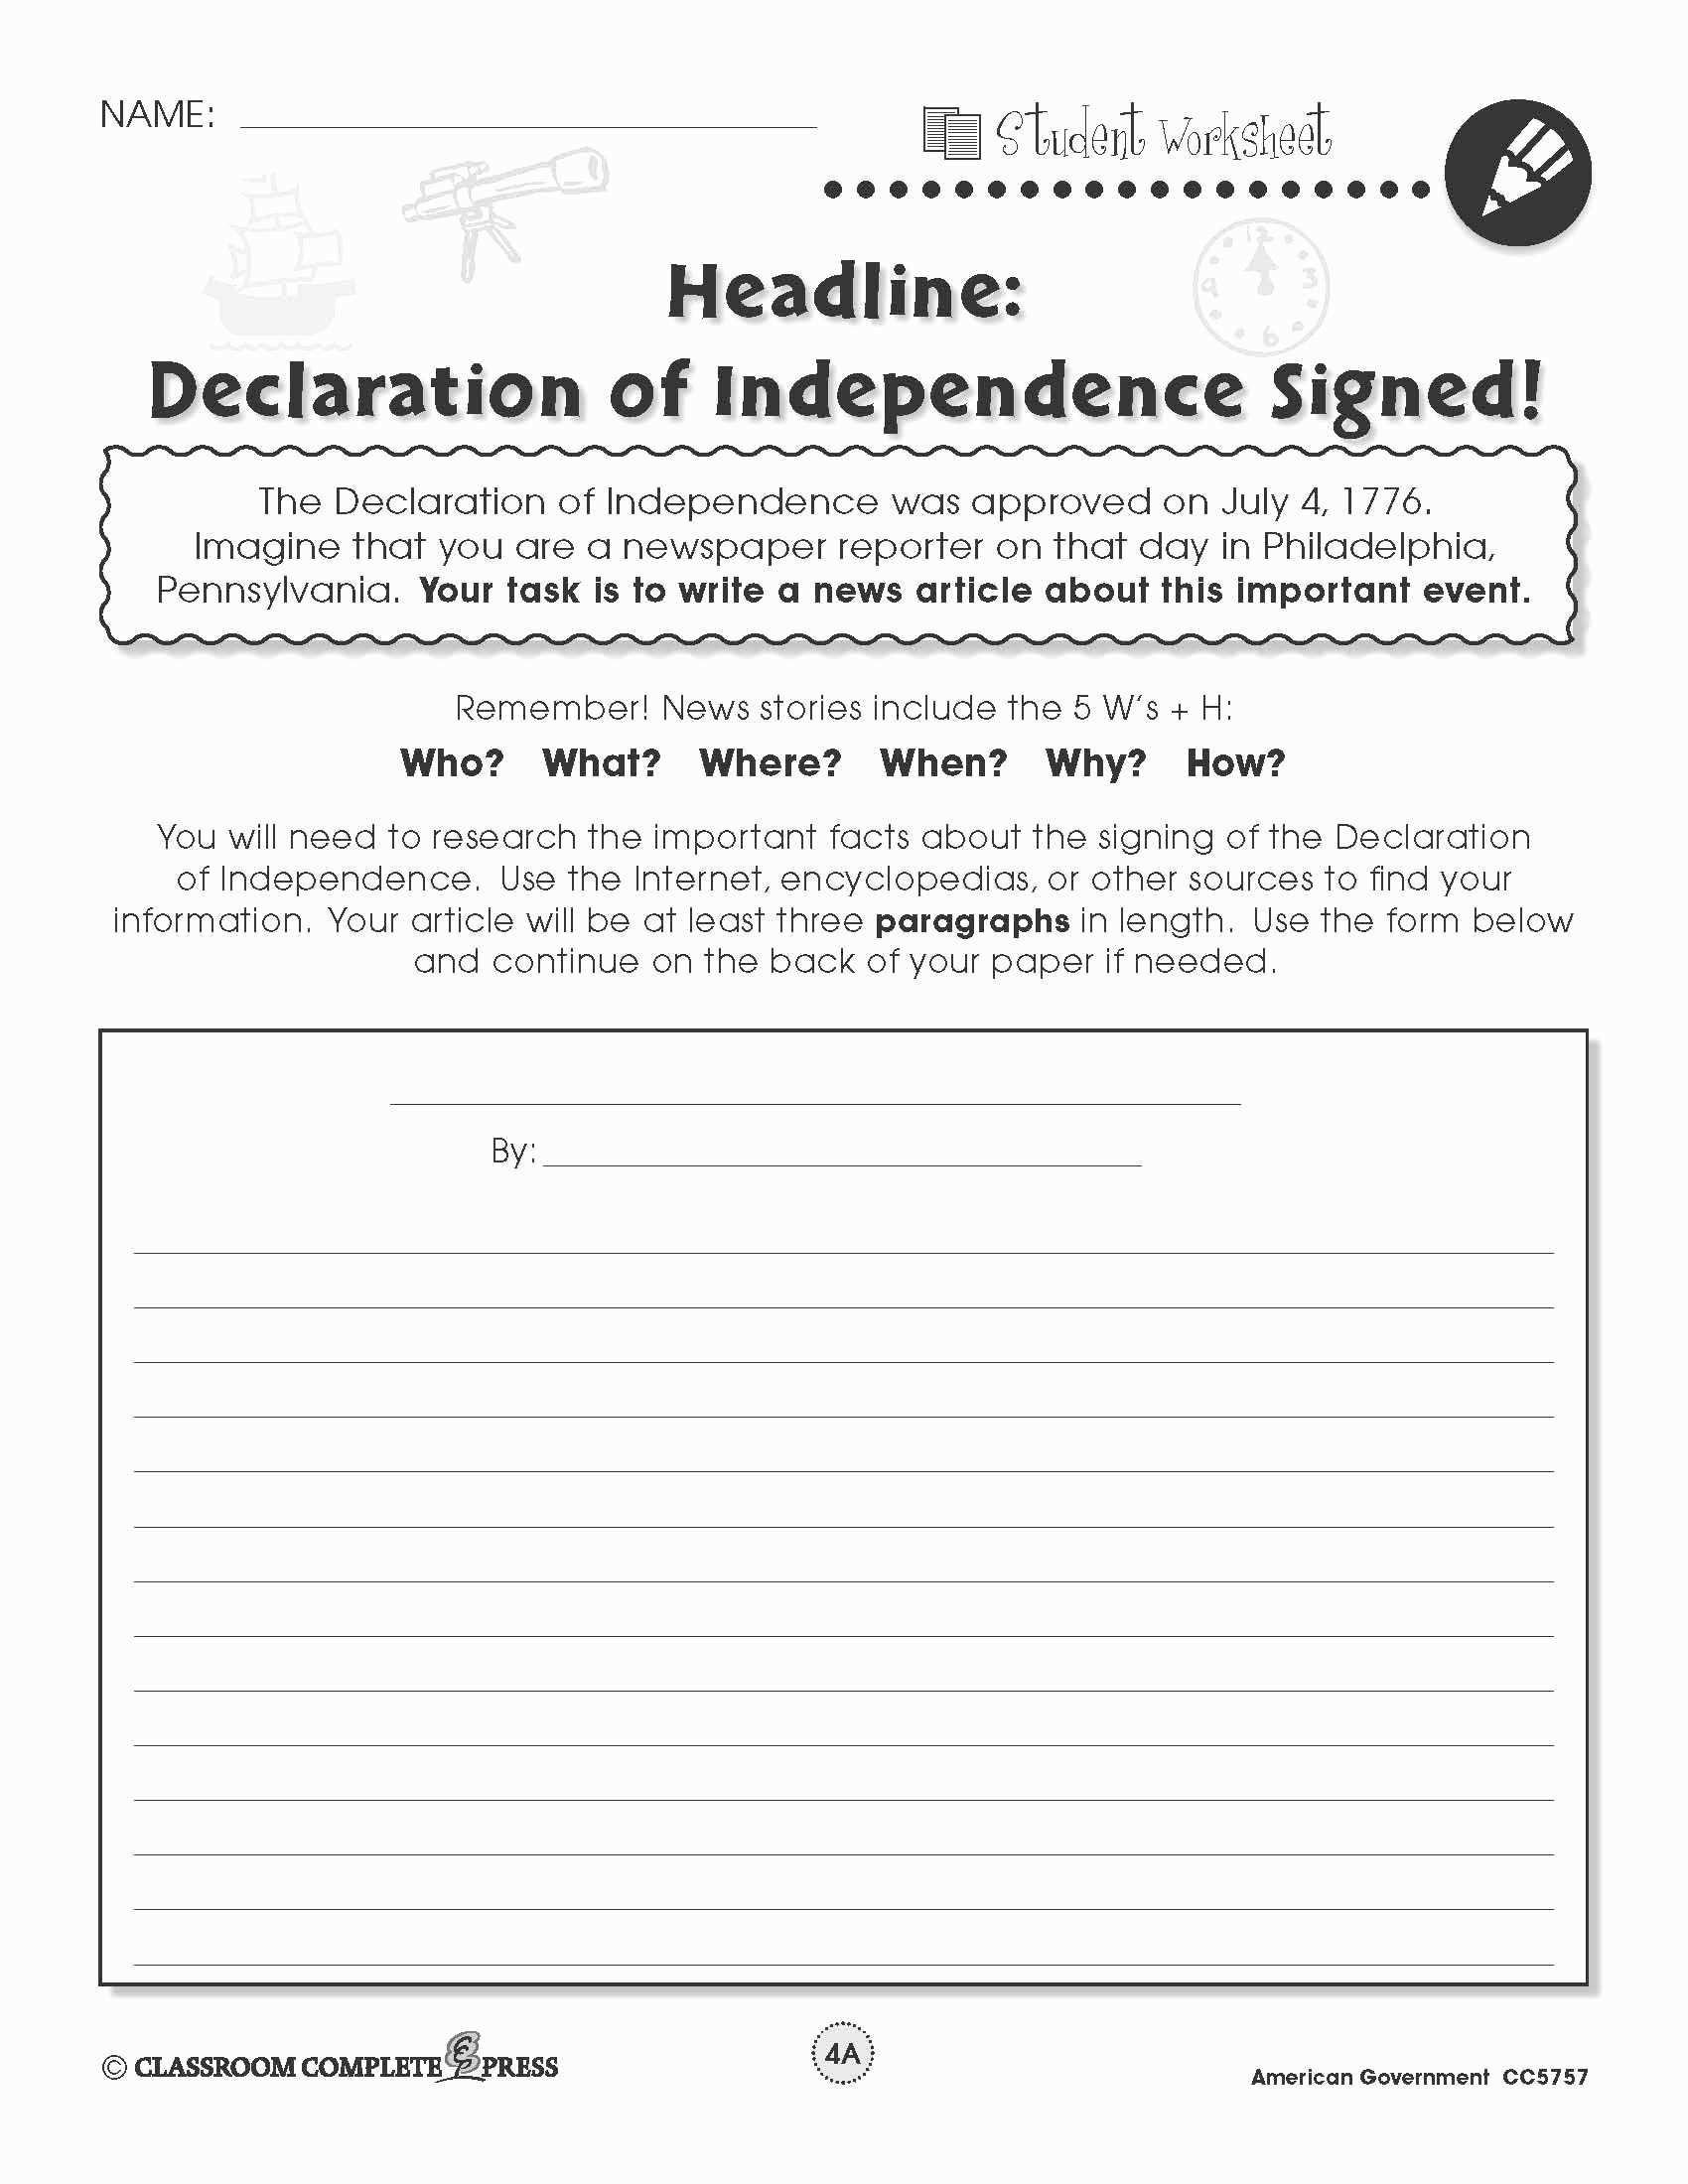 medium resolution of Mark Twain Worksheet Answers   Social studies worksheets